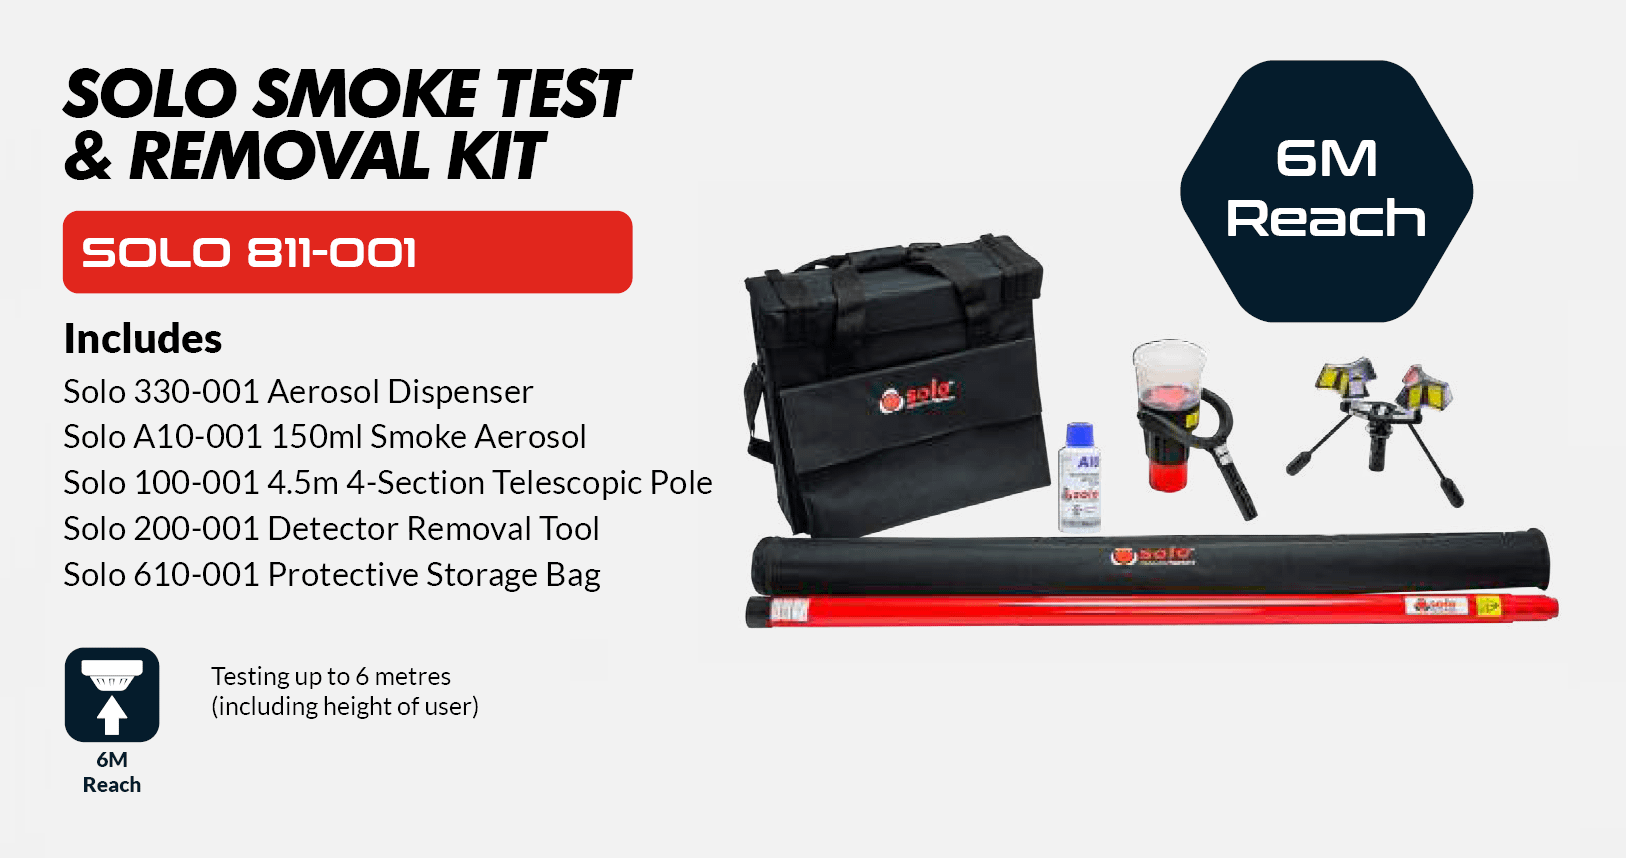 solo-detector-testers-testifire-no-climb-811-smoke-detector-test-kit-singapore